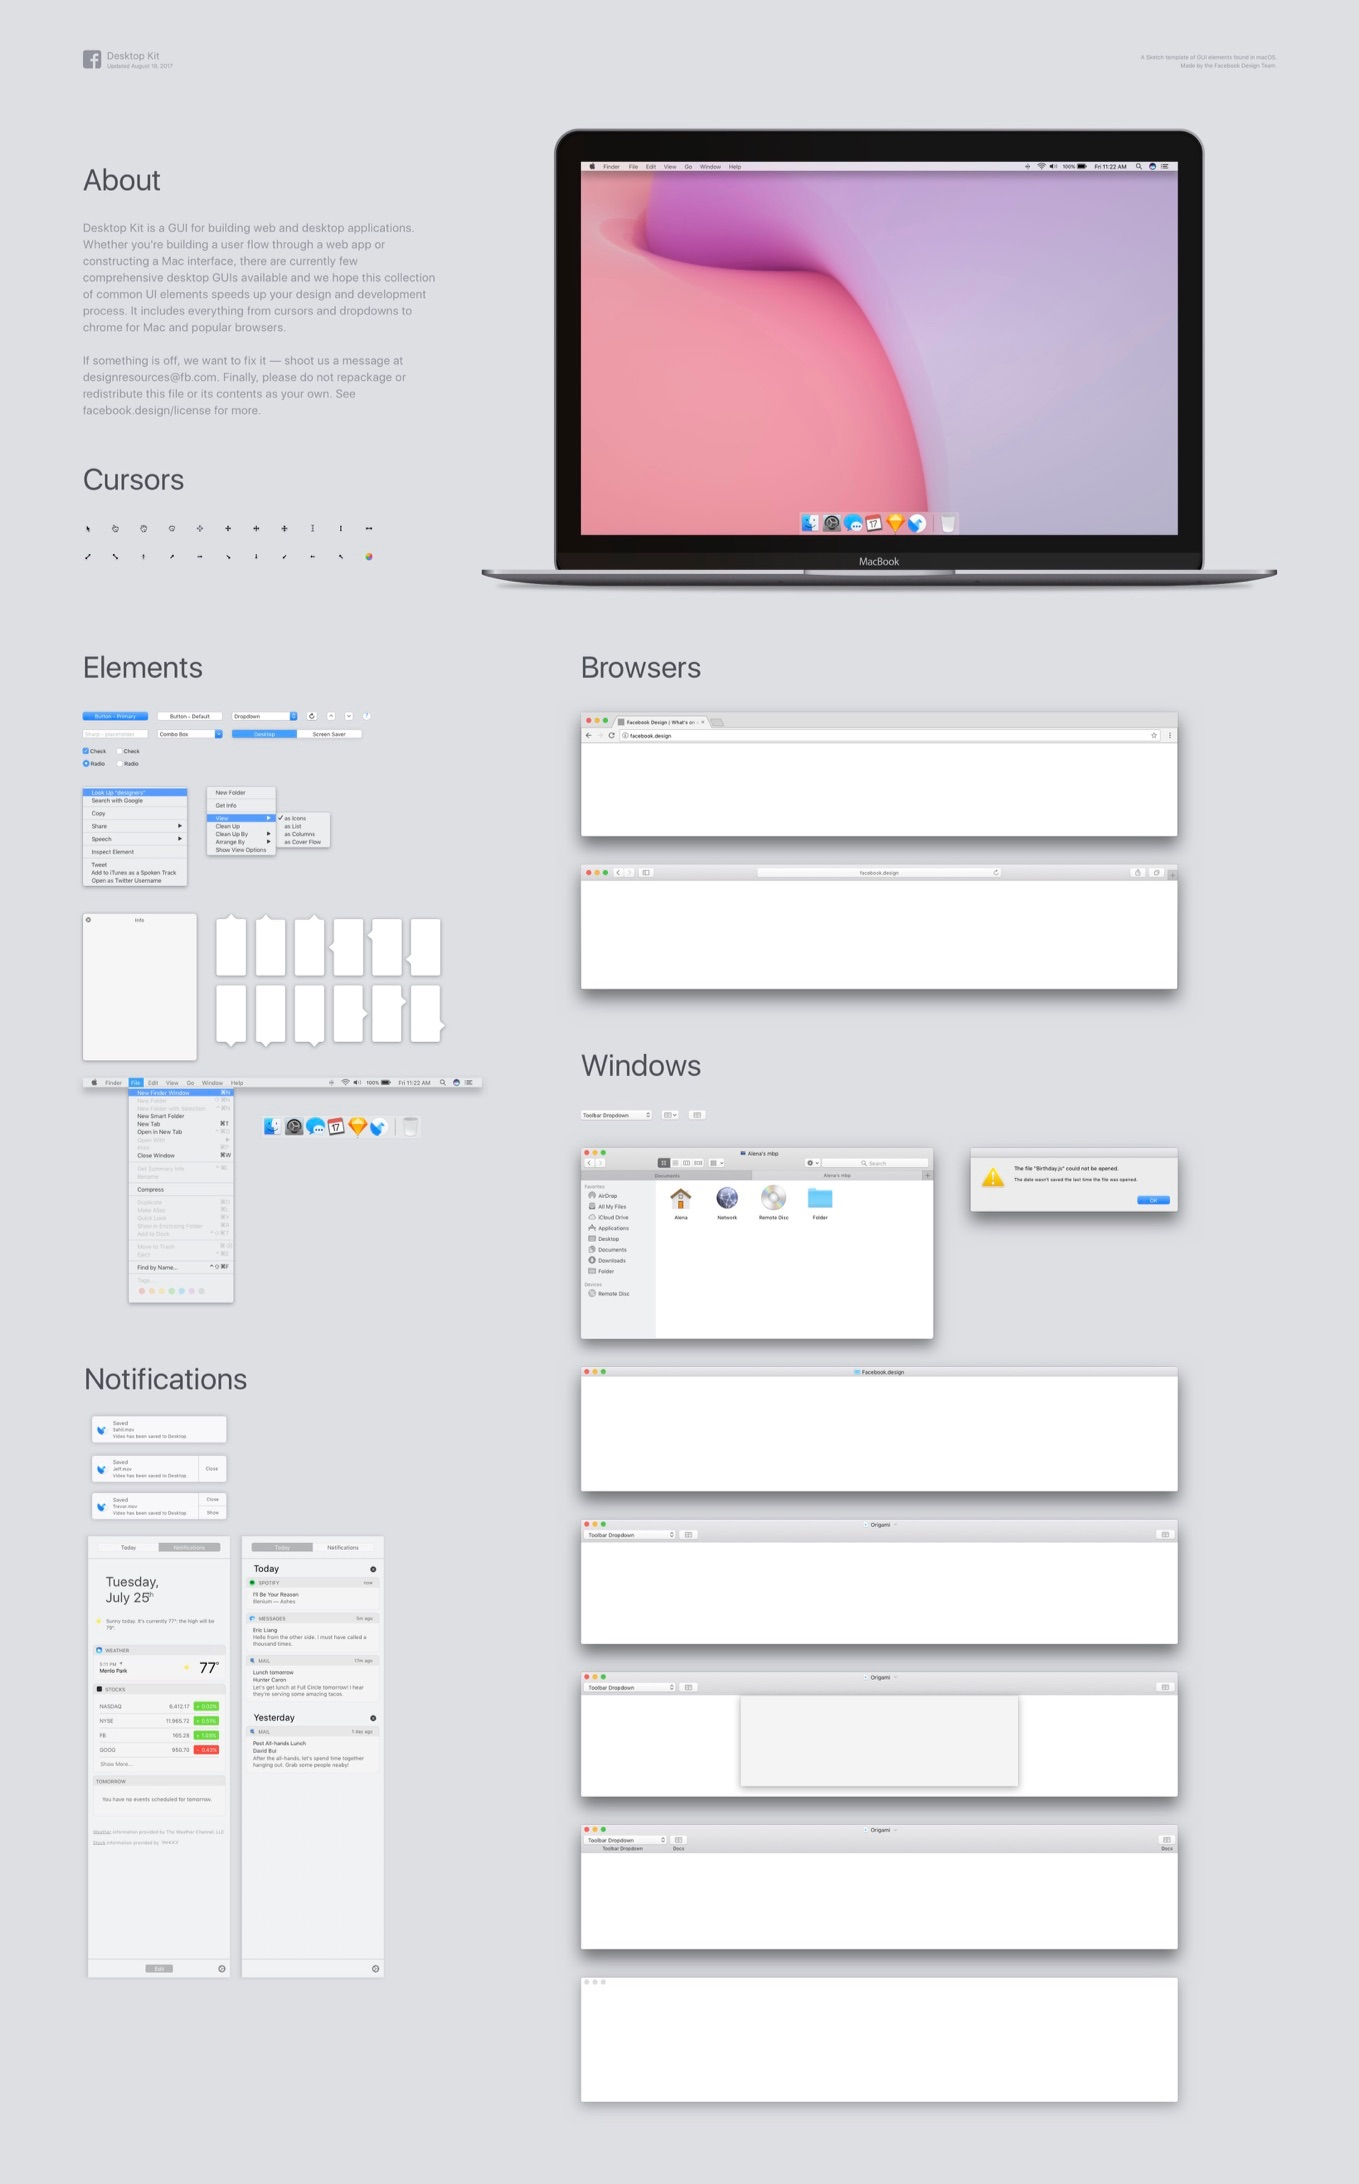 facebook design macosのui elementを再現したsketch用テンプレート